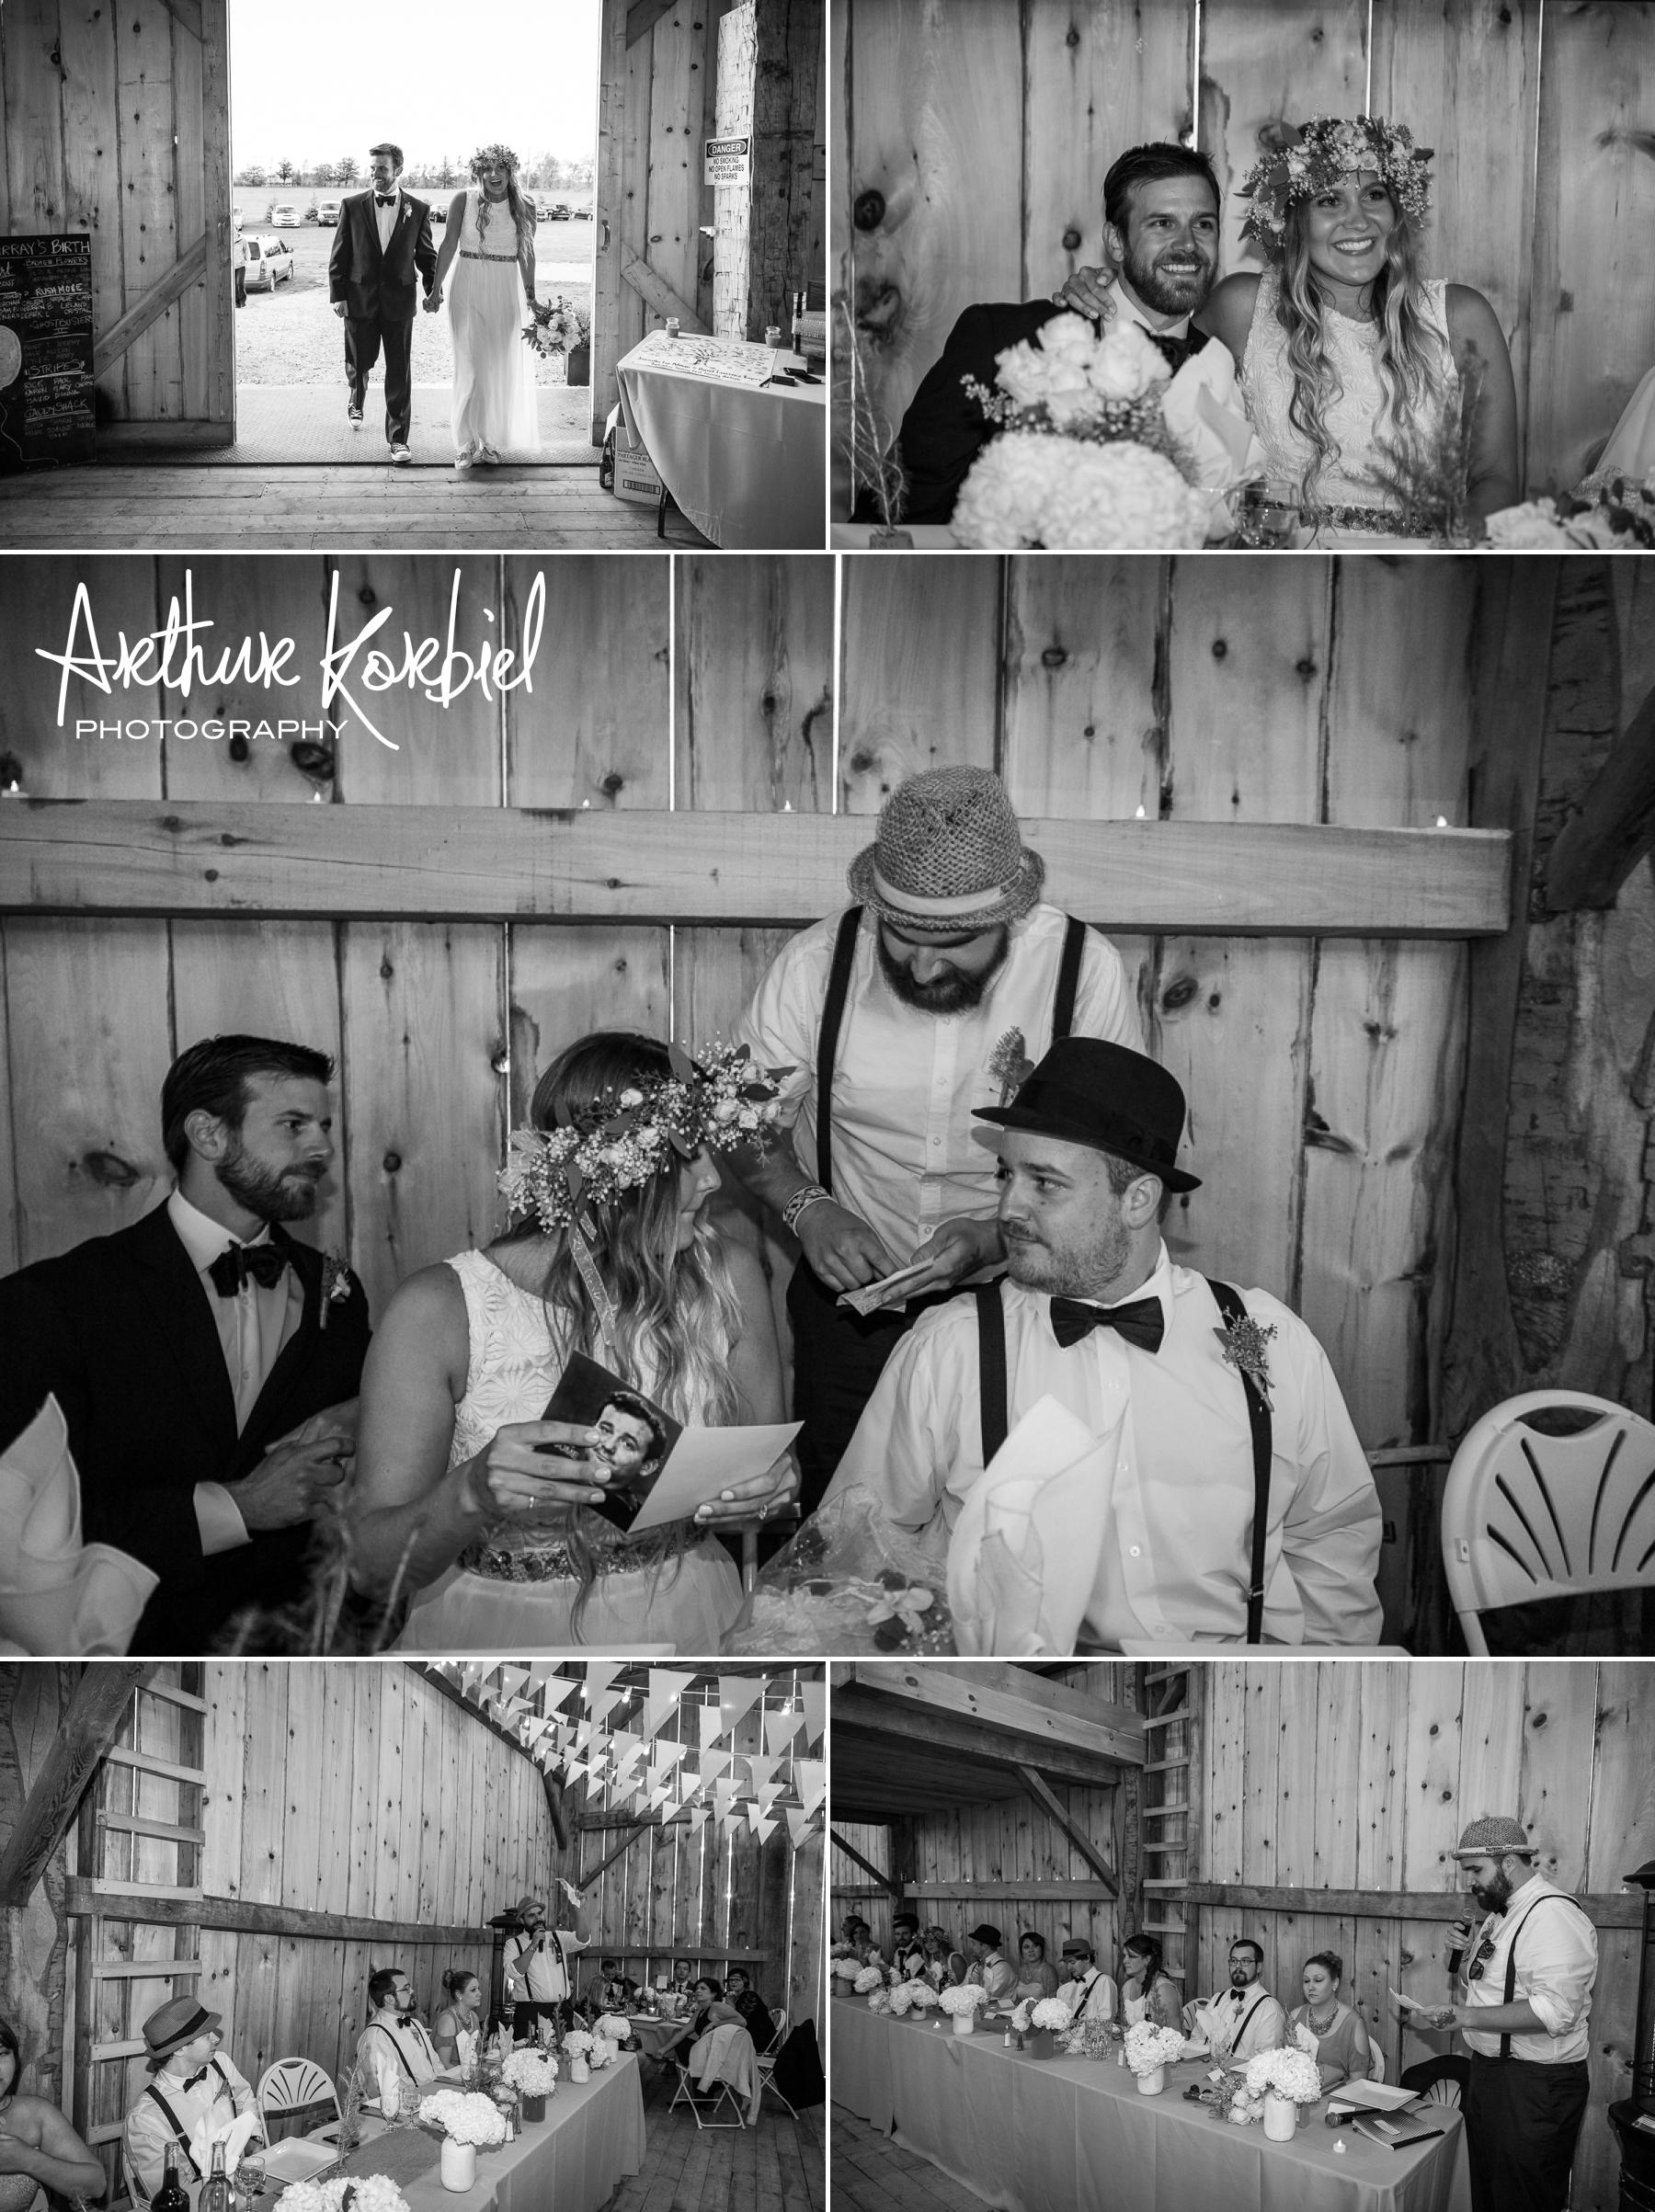 Arthur Korbiel Photography - London Engagement Photographer - Sauble Beach Barn Wedding - Samantha & Dan_011.jpg